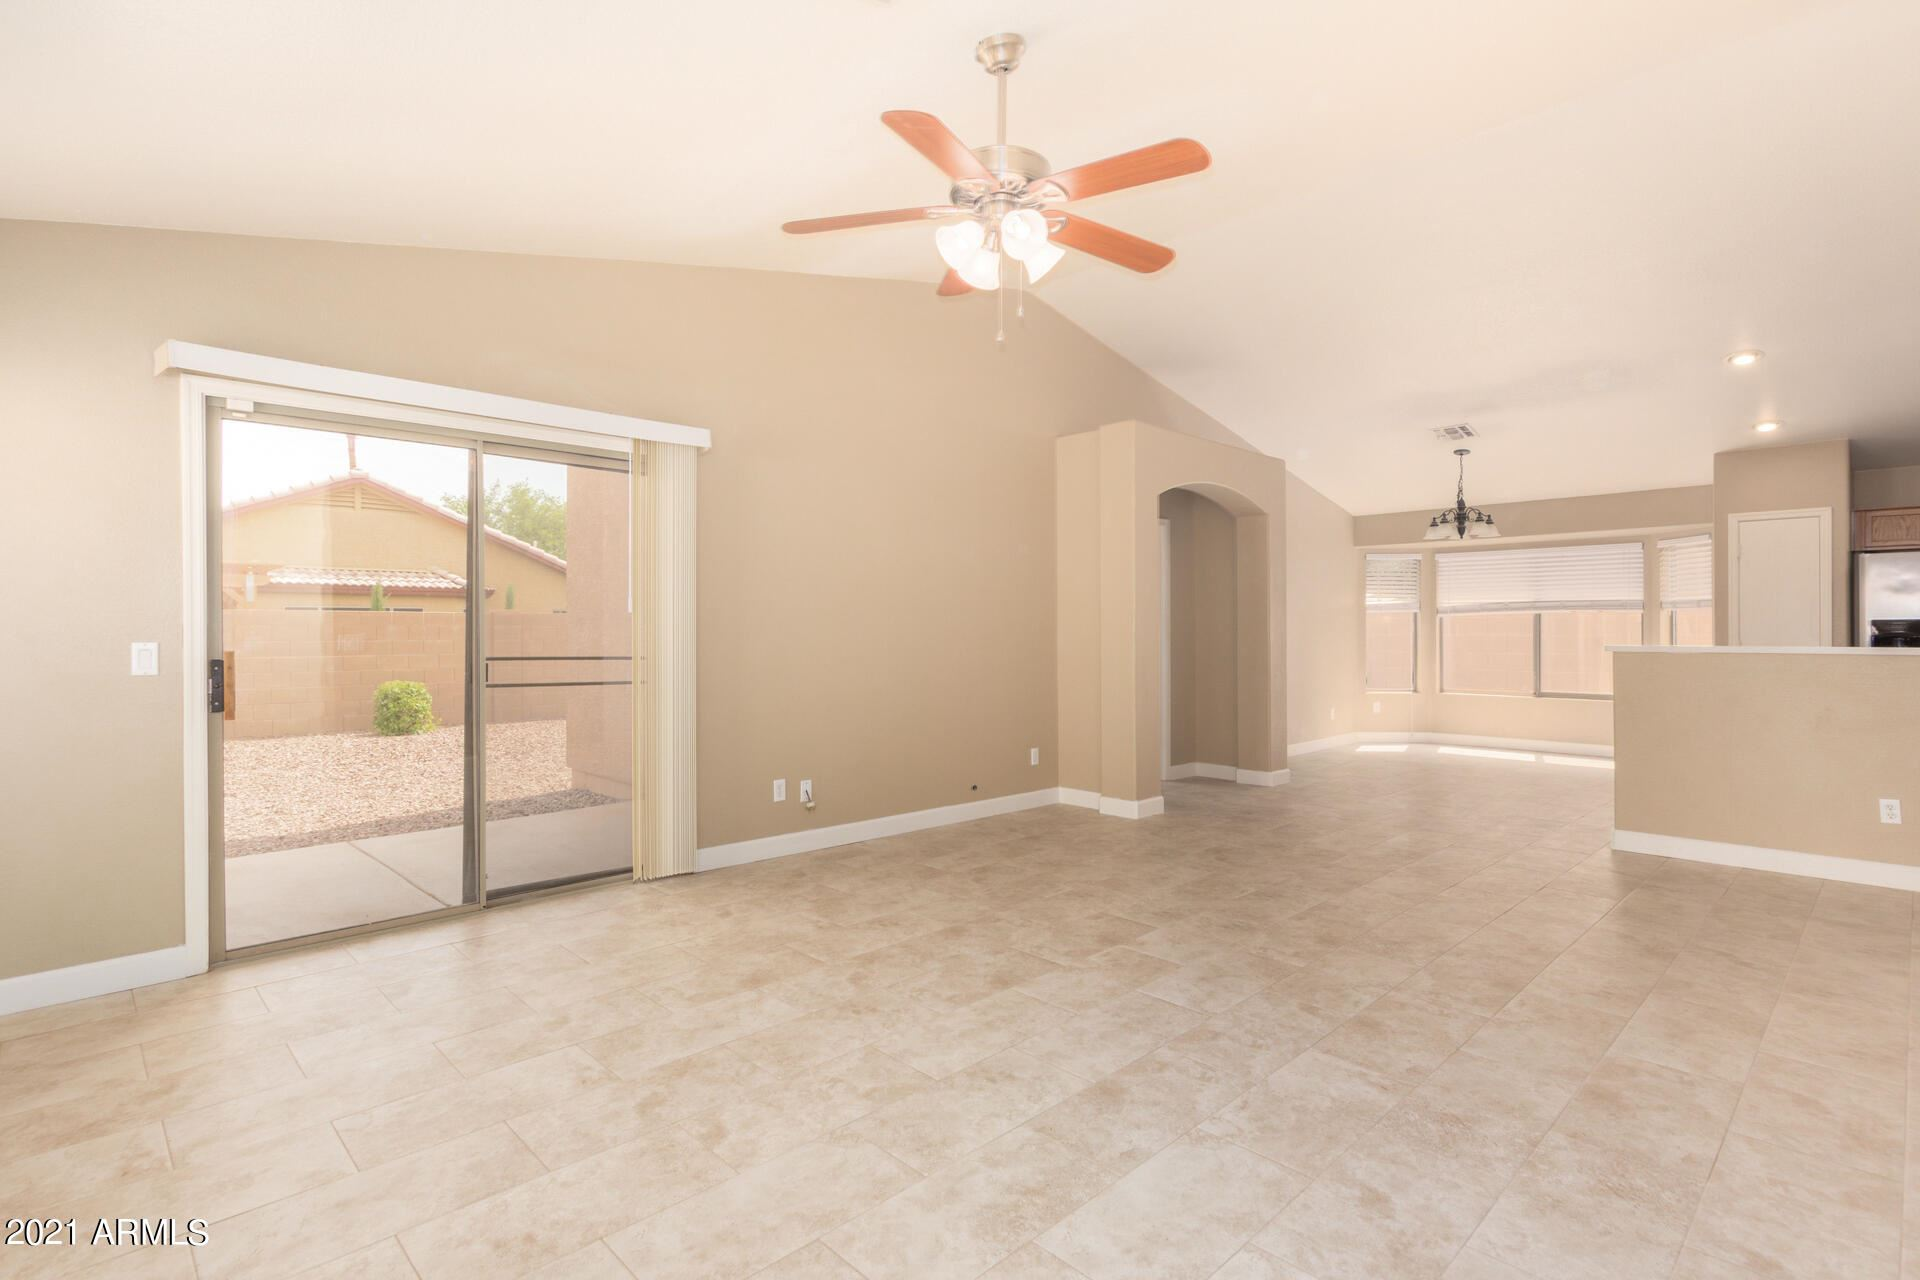 Photo of 16235 W STATLER Street, Surprise, AZ 85374 (MLS # 6269253)